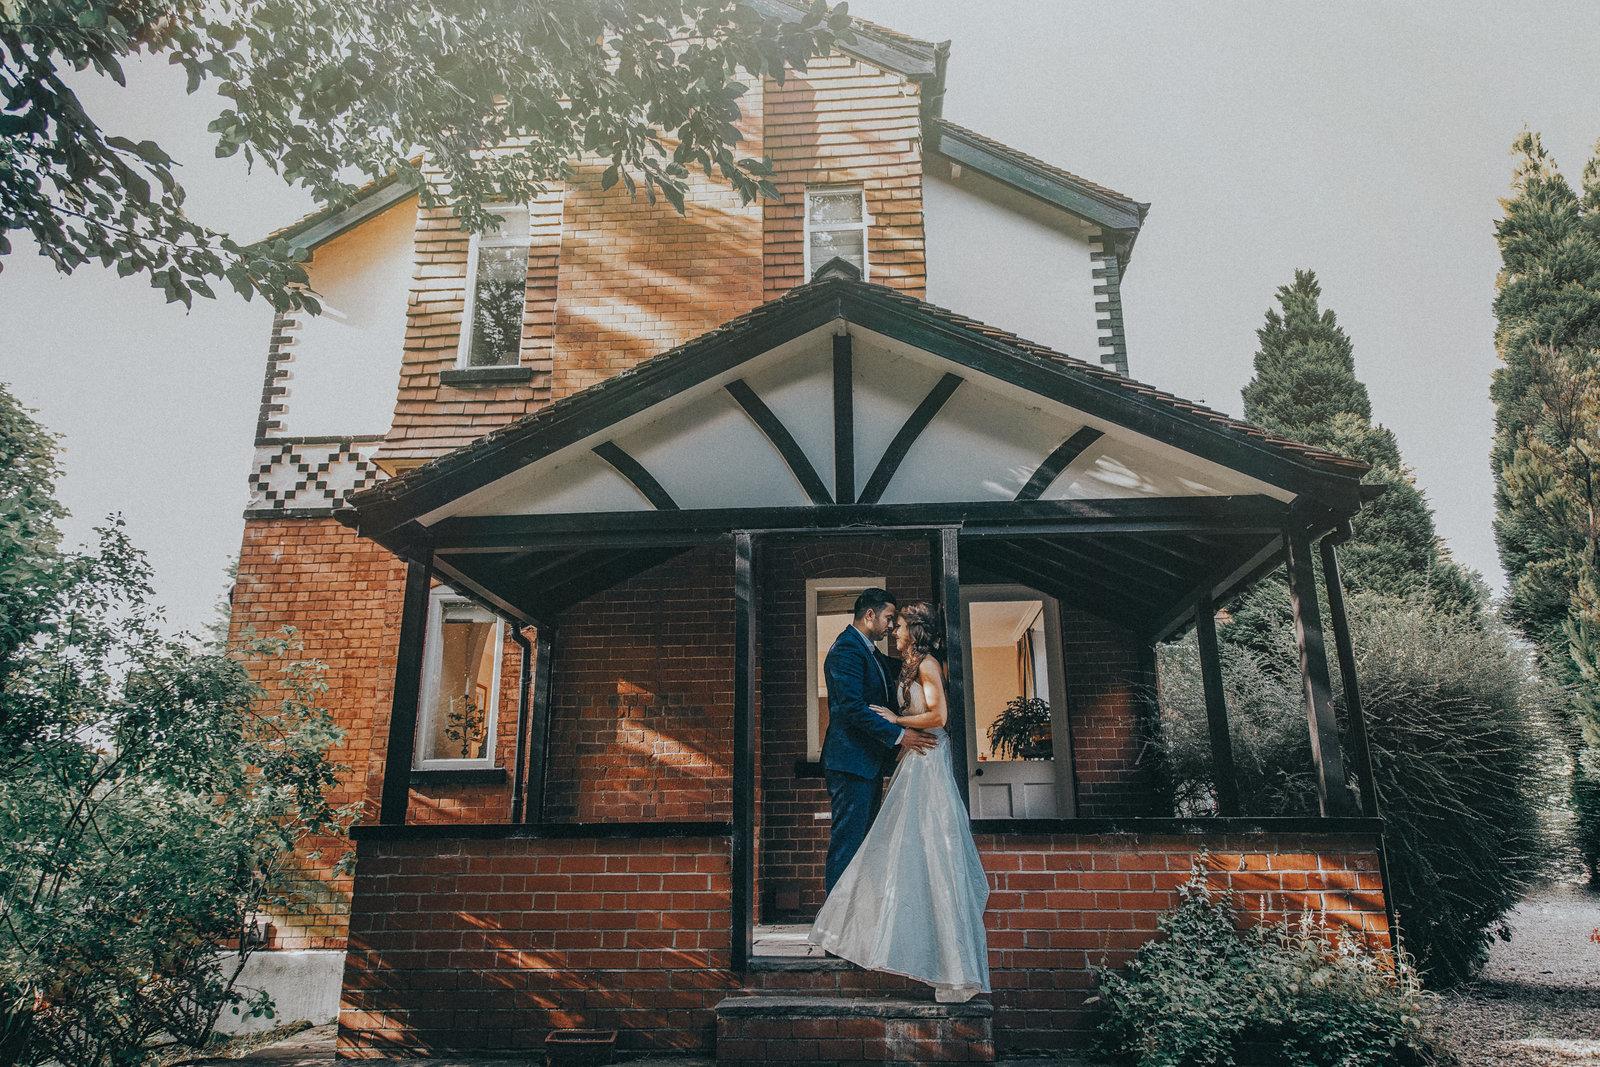 Bride & Groom kissing on porch f their home - Manchester Wedding Photographer Jono Symonds